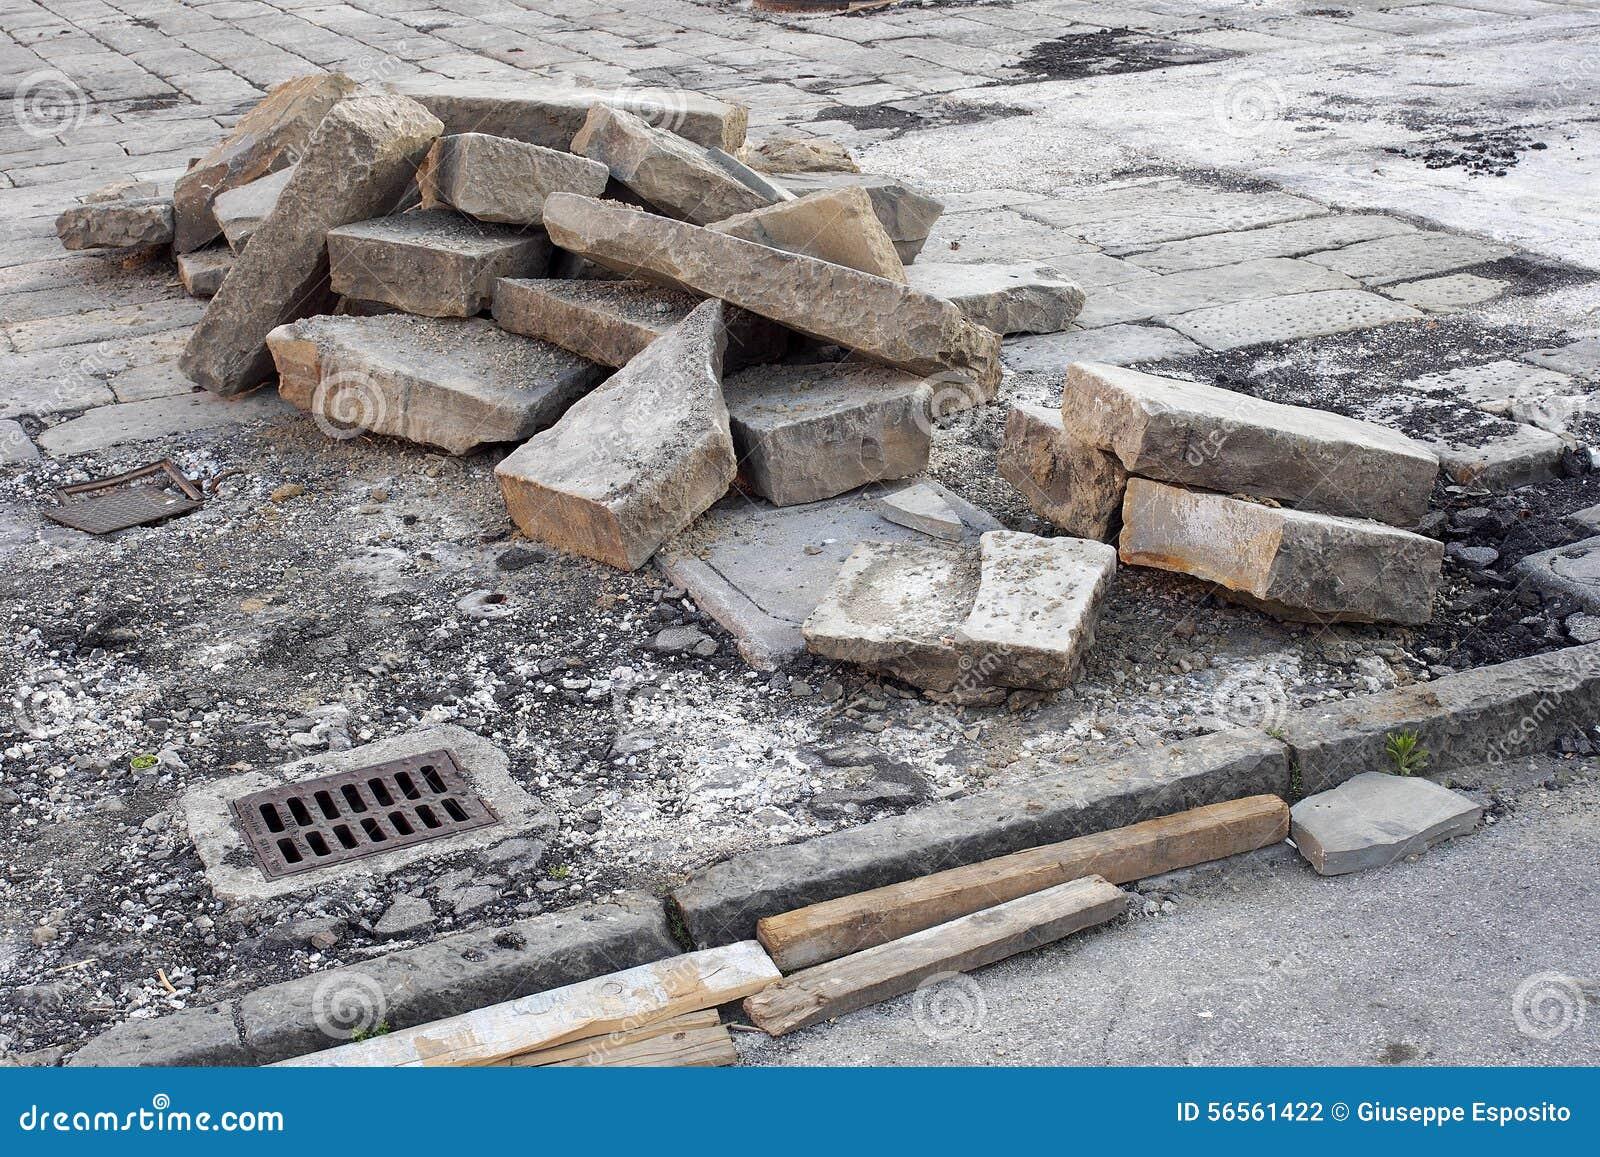 Download Έργο υπό κατασκευή Πεζοδρόμιο και δρόμος Αφαιρούμενοι φραγμοί Στοκ Εικόνες - εικόνα από έξω, βιομηχανία: 56561422